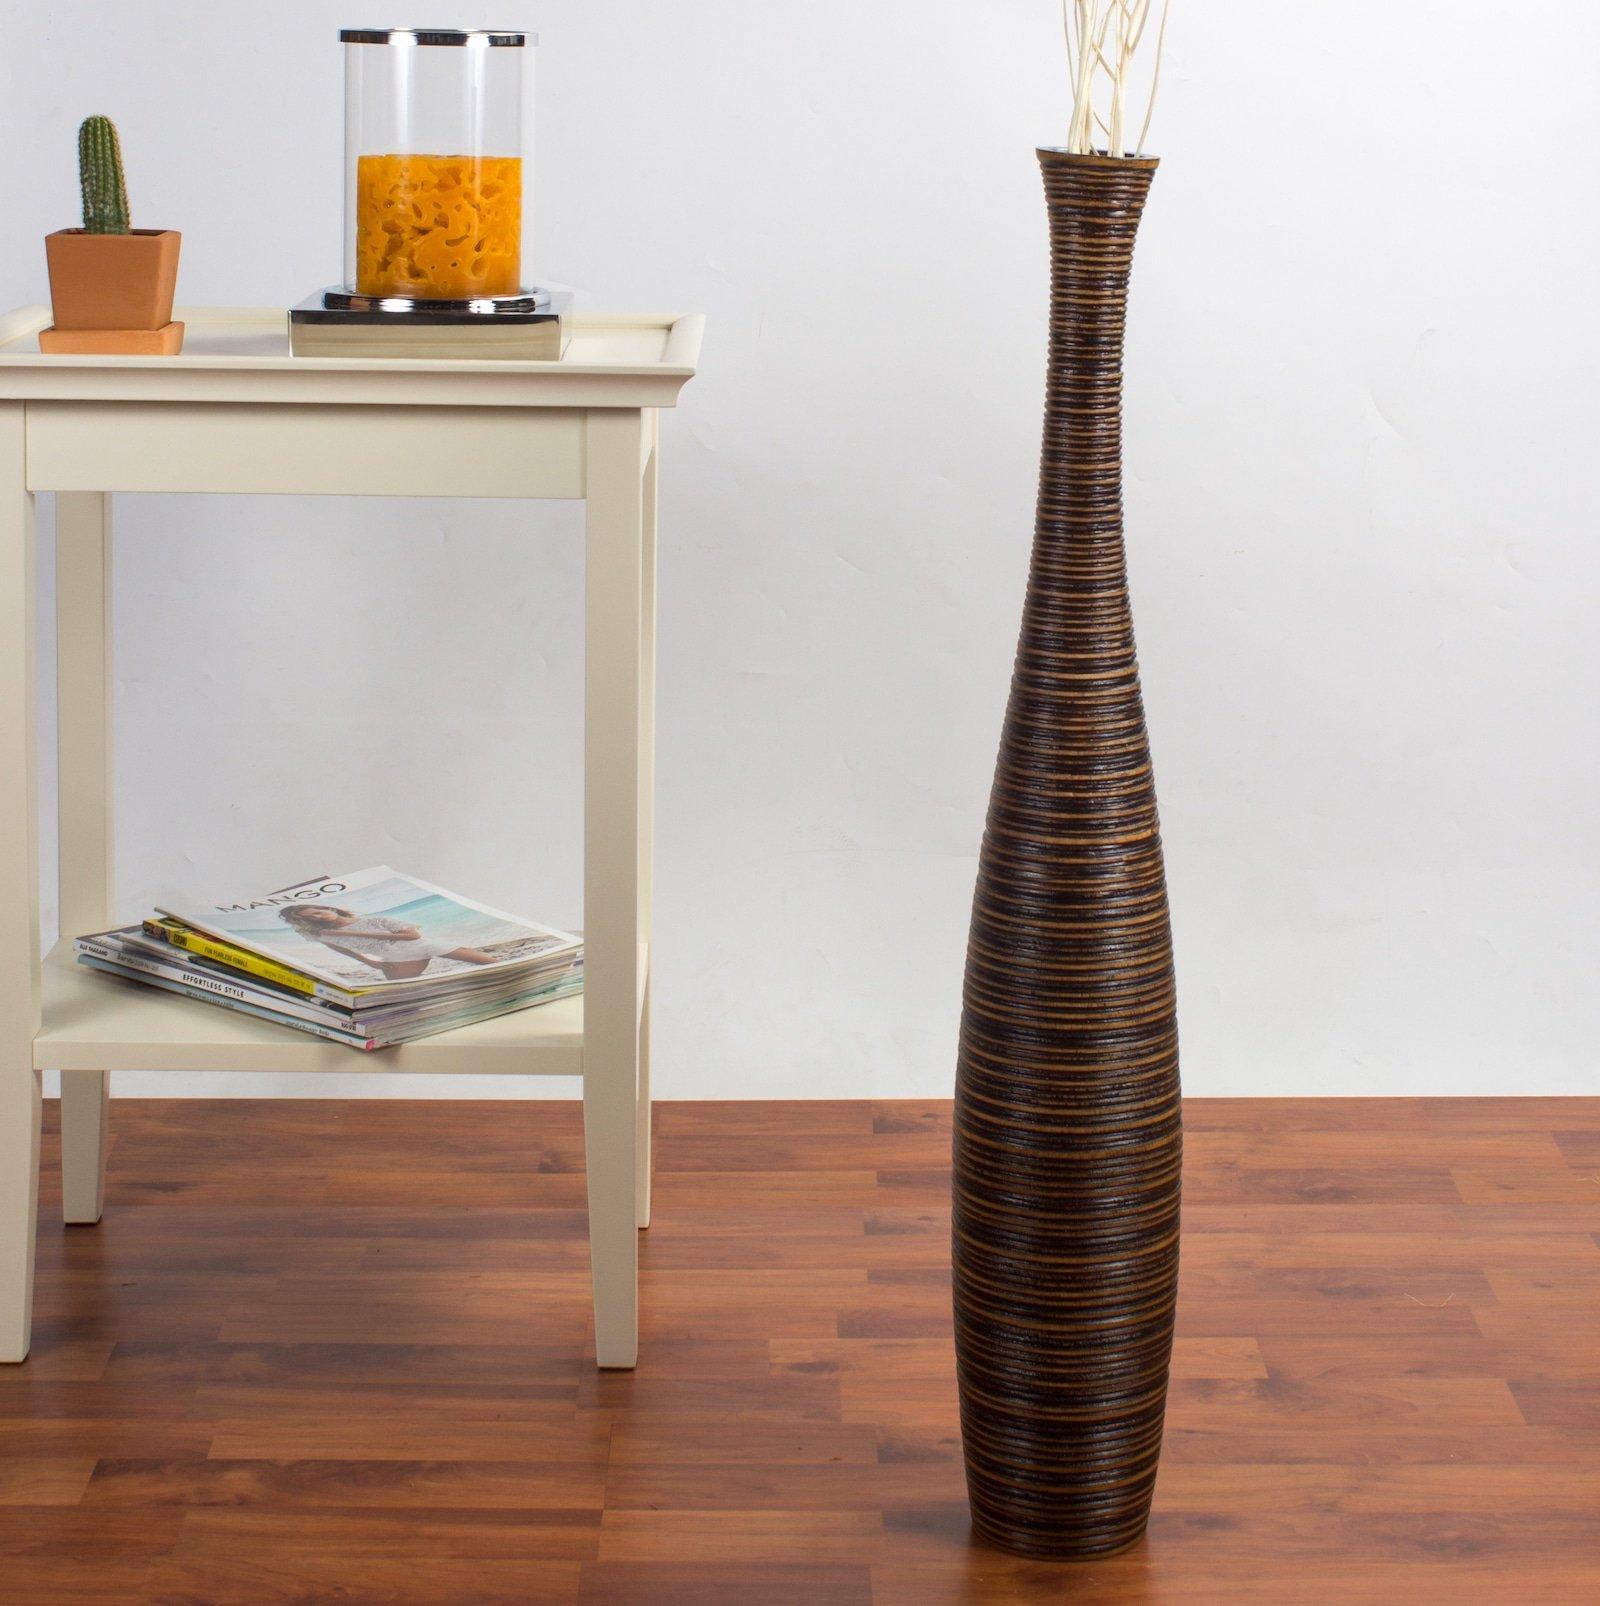 Vaso modern con design etnico.